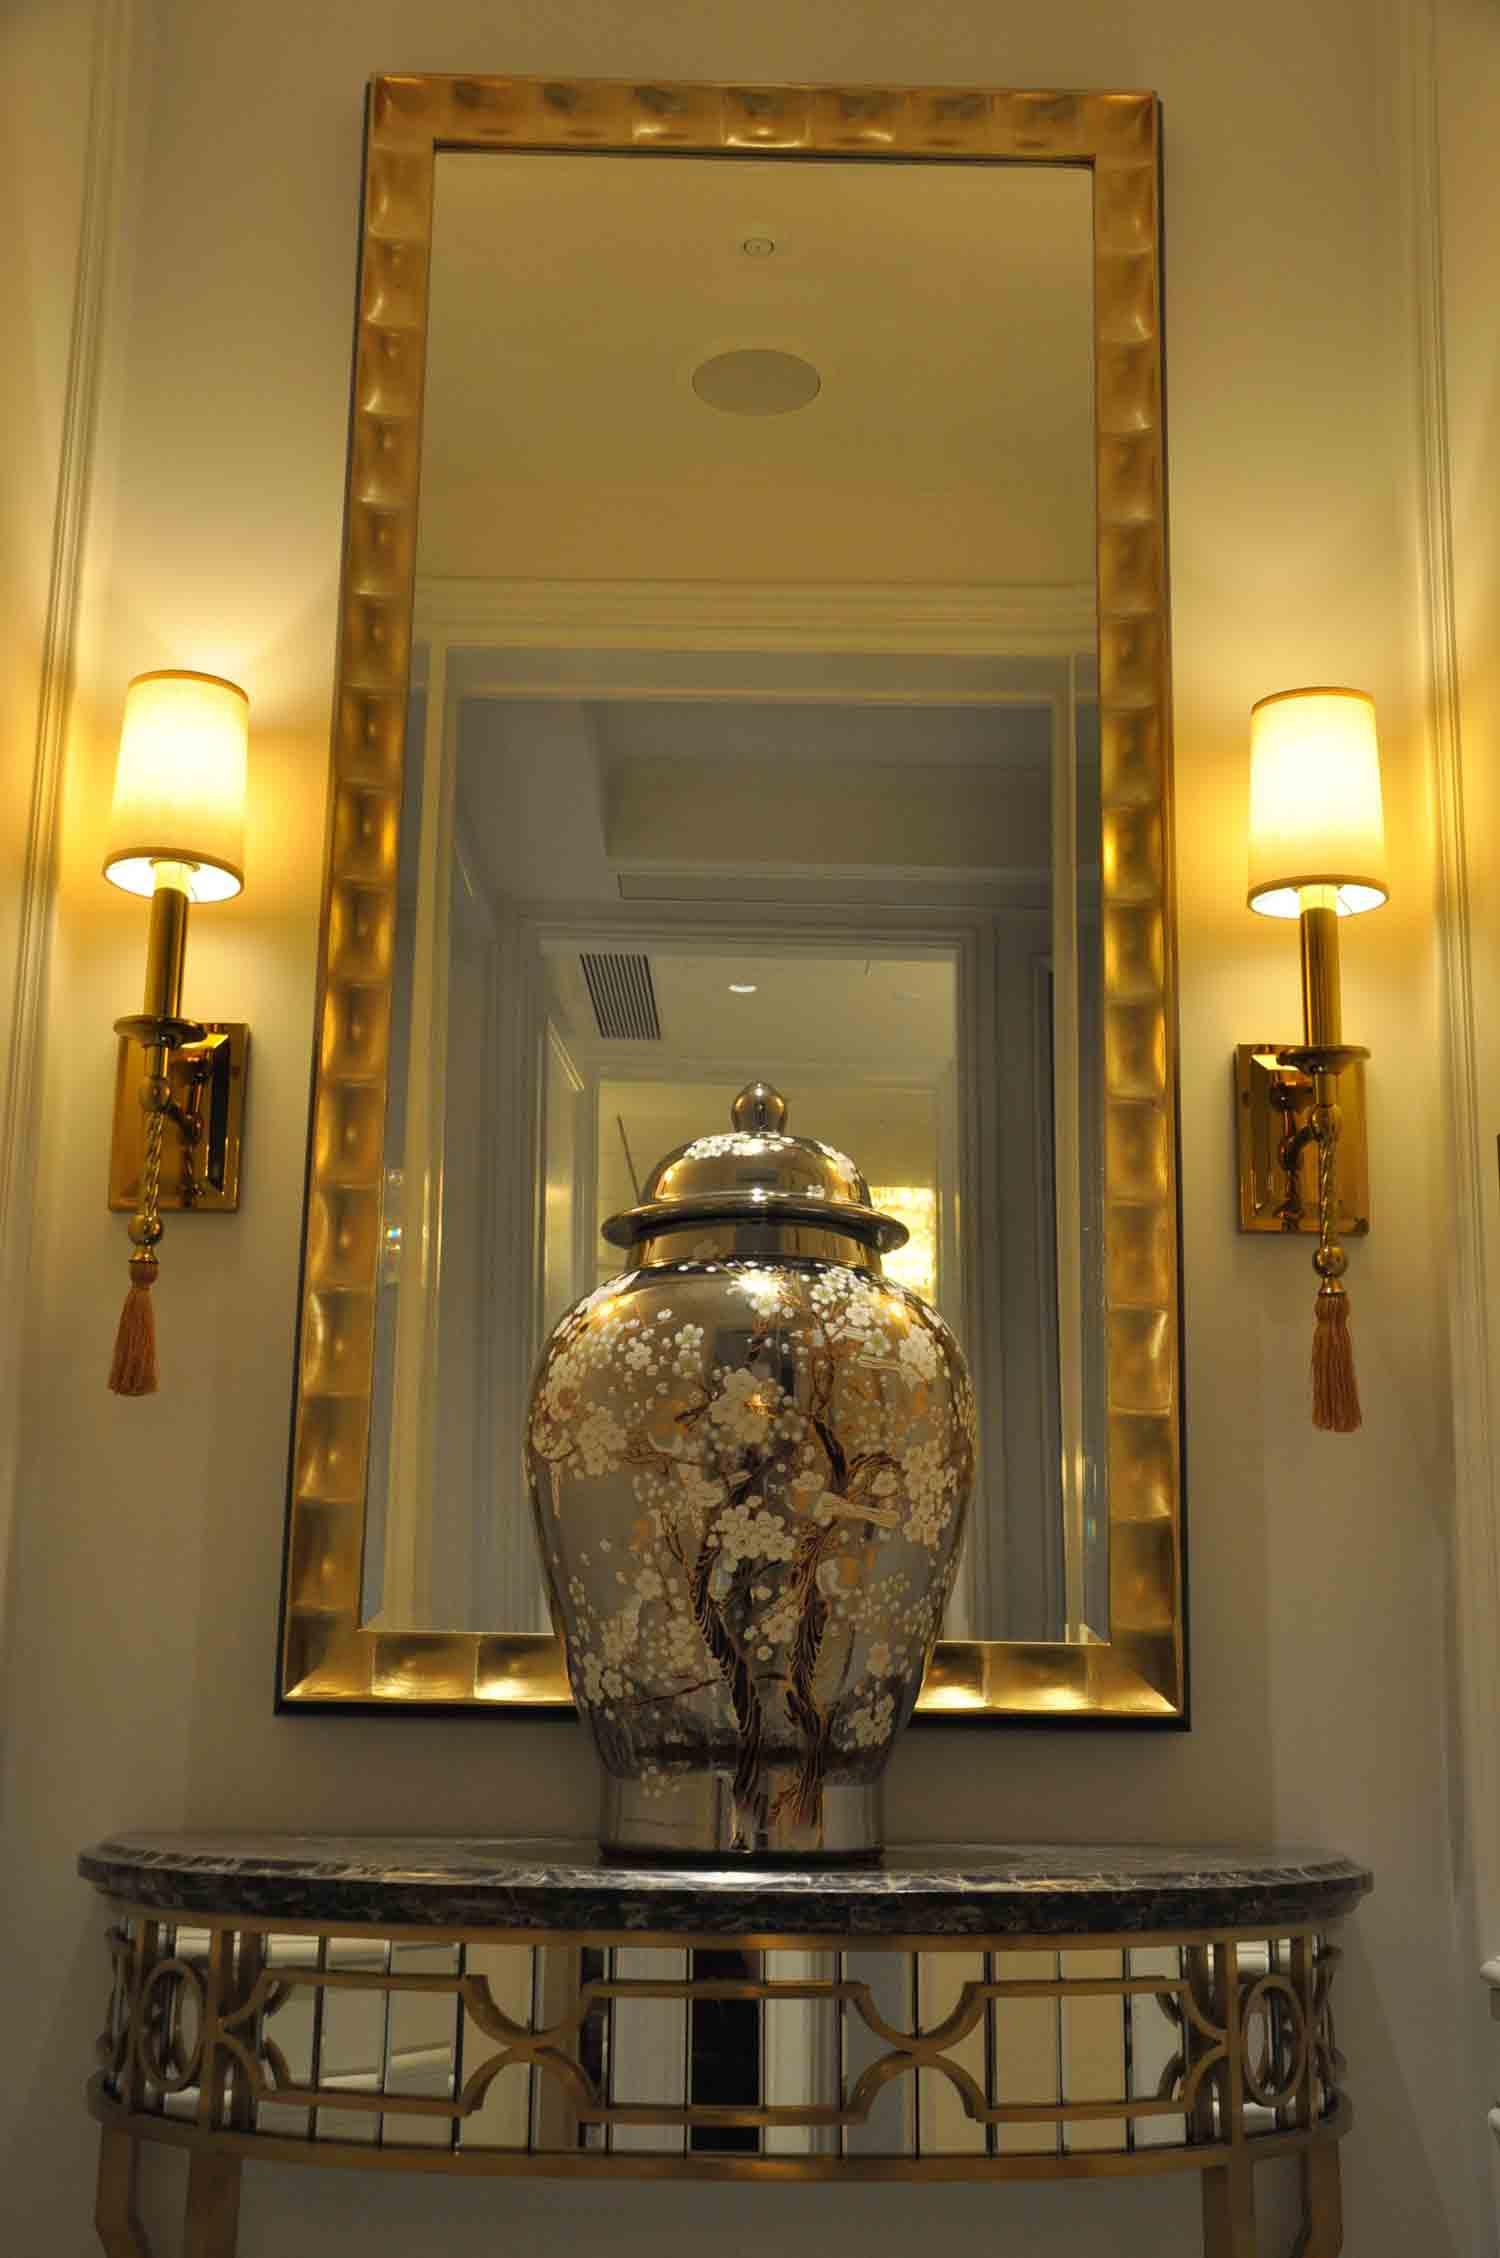 Ritz-Carlton Macau Premier Suite mirror and artwork